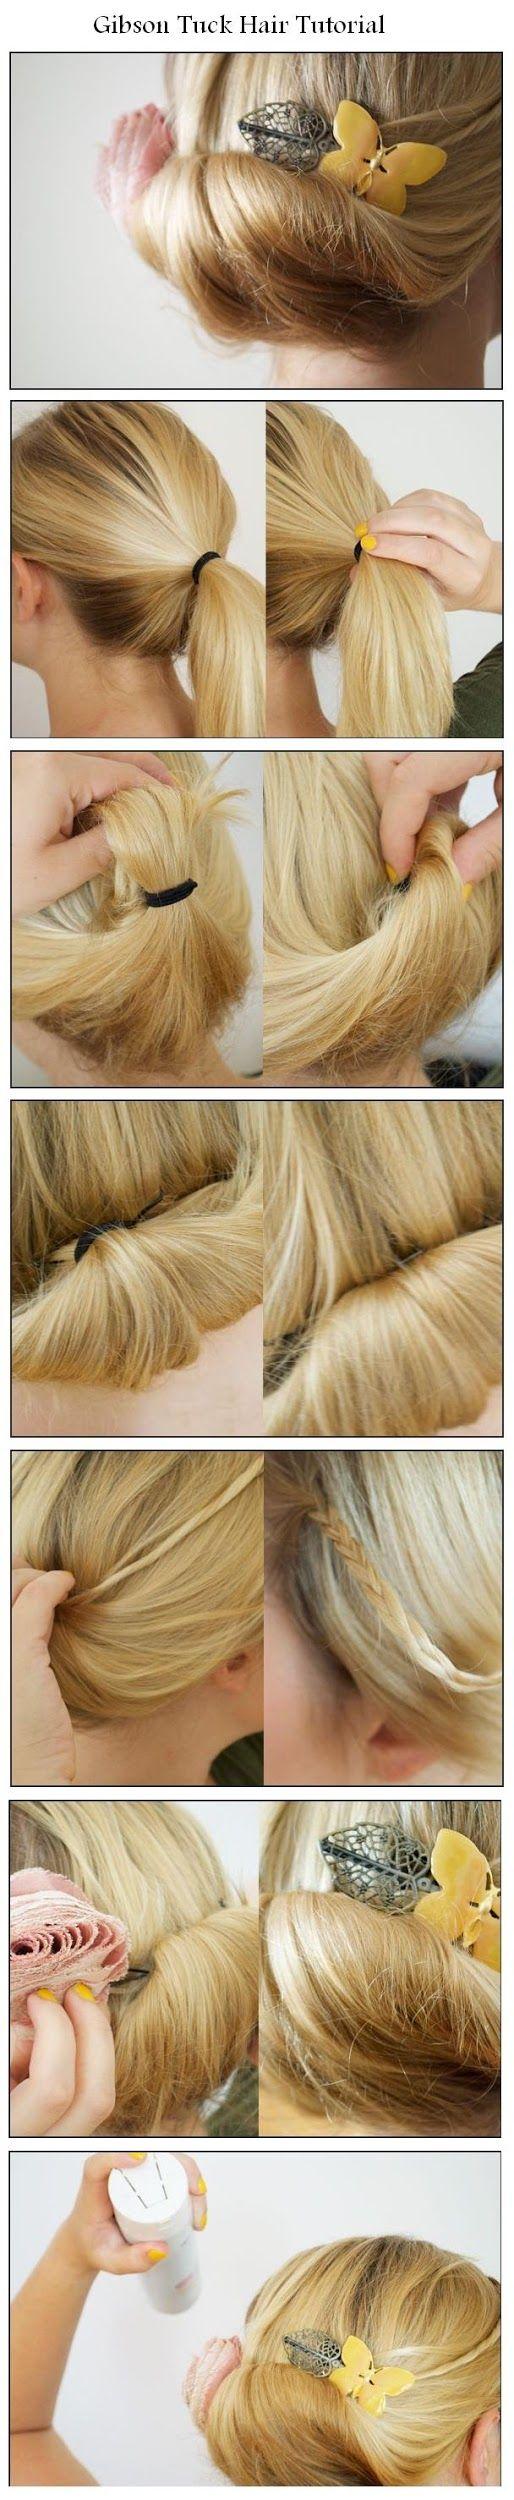 Gibson Tuck Hair Tutorial | hairstyles tutorial